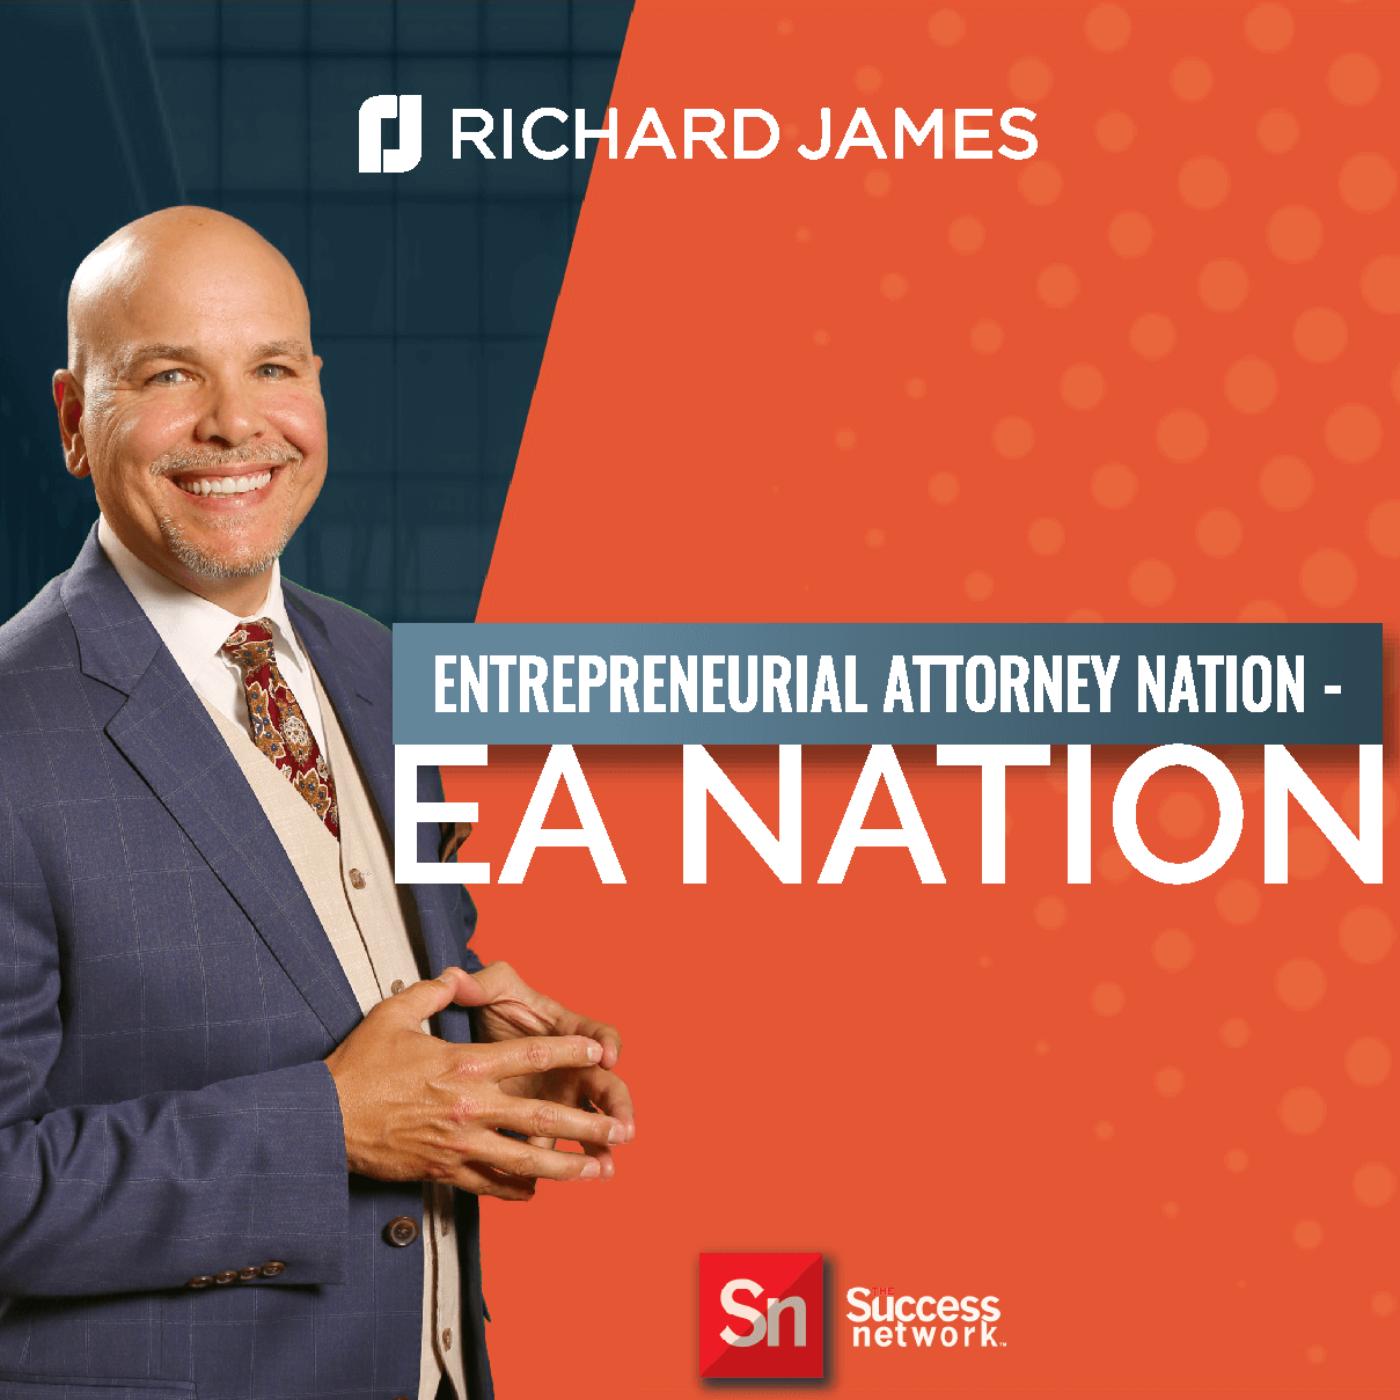 Artwork for podcast Entrepreneurial Attorney Nation